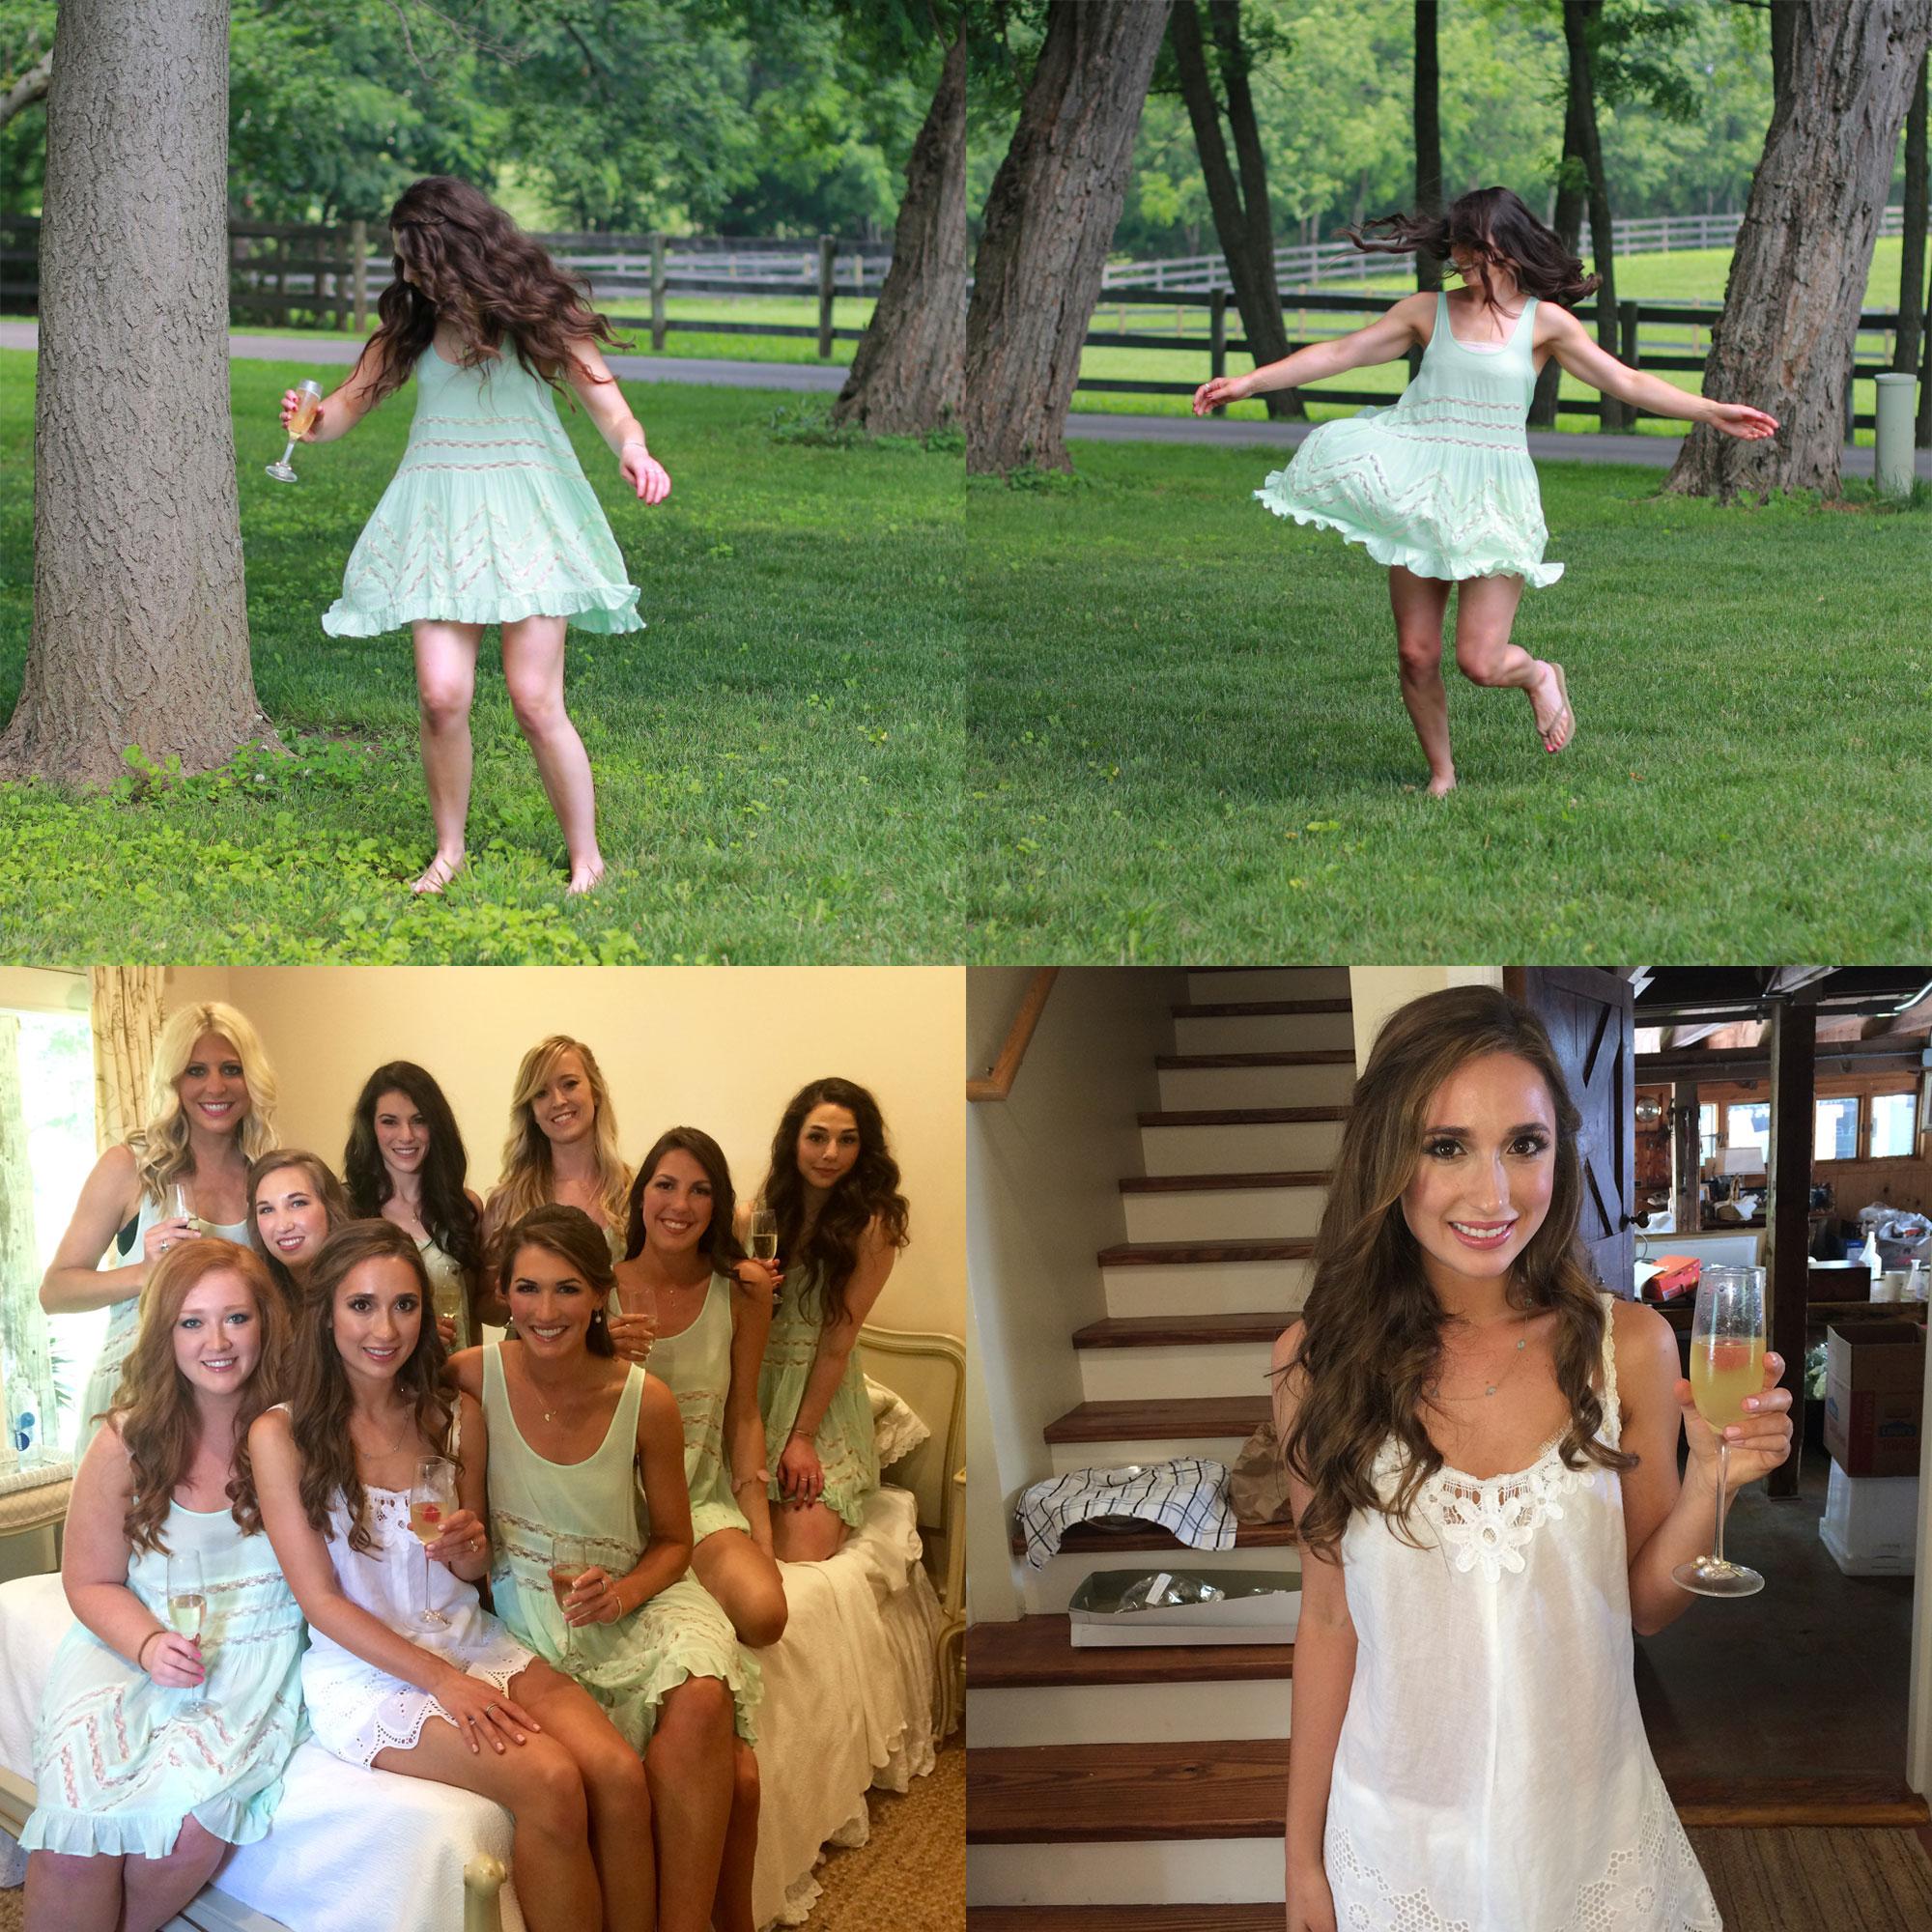 Free People Slip Dress, Bridesmaids Getting Ready Outfits, Bride Getting Ready Outfit